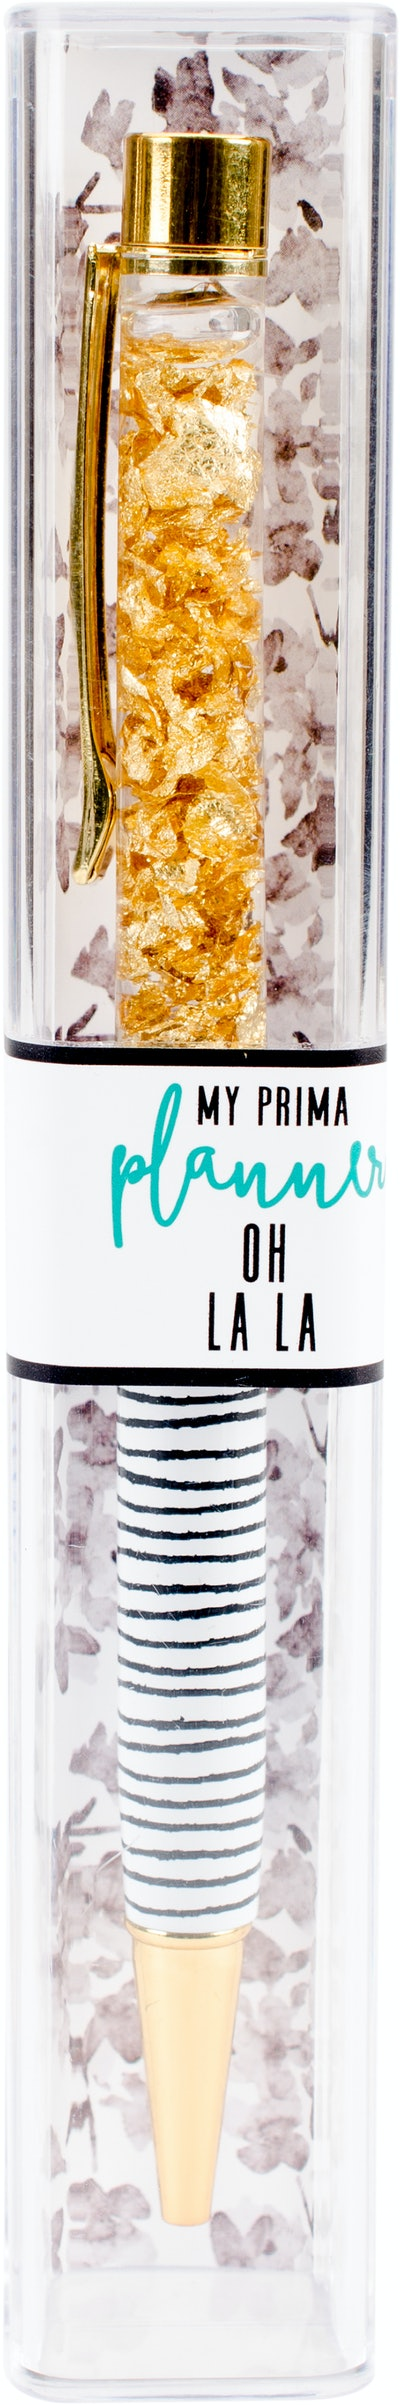 My Prima Planner Ballpoint Pen-Oh La La